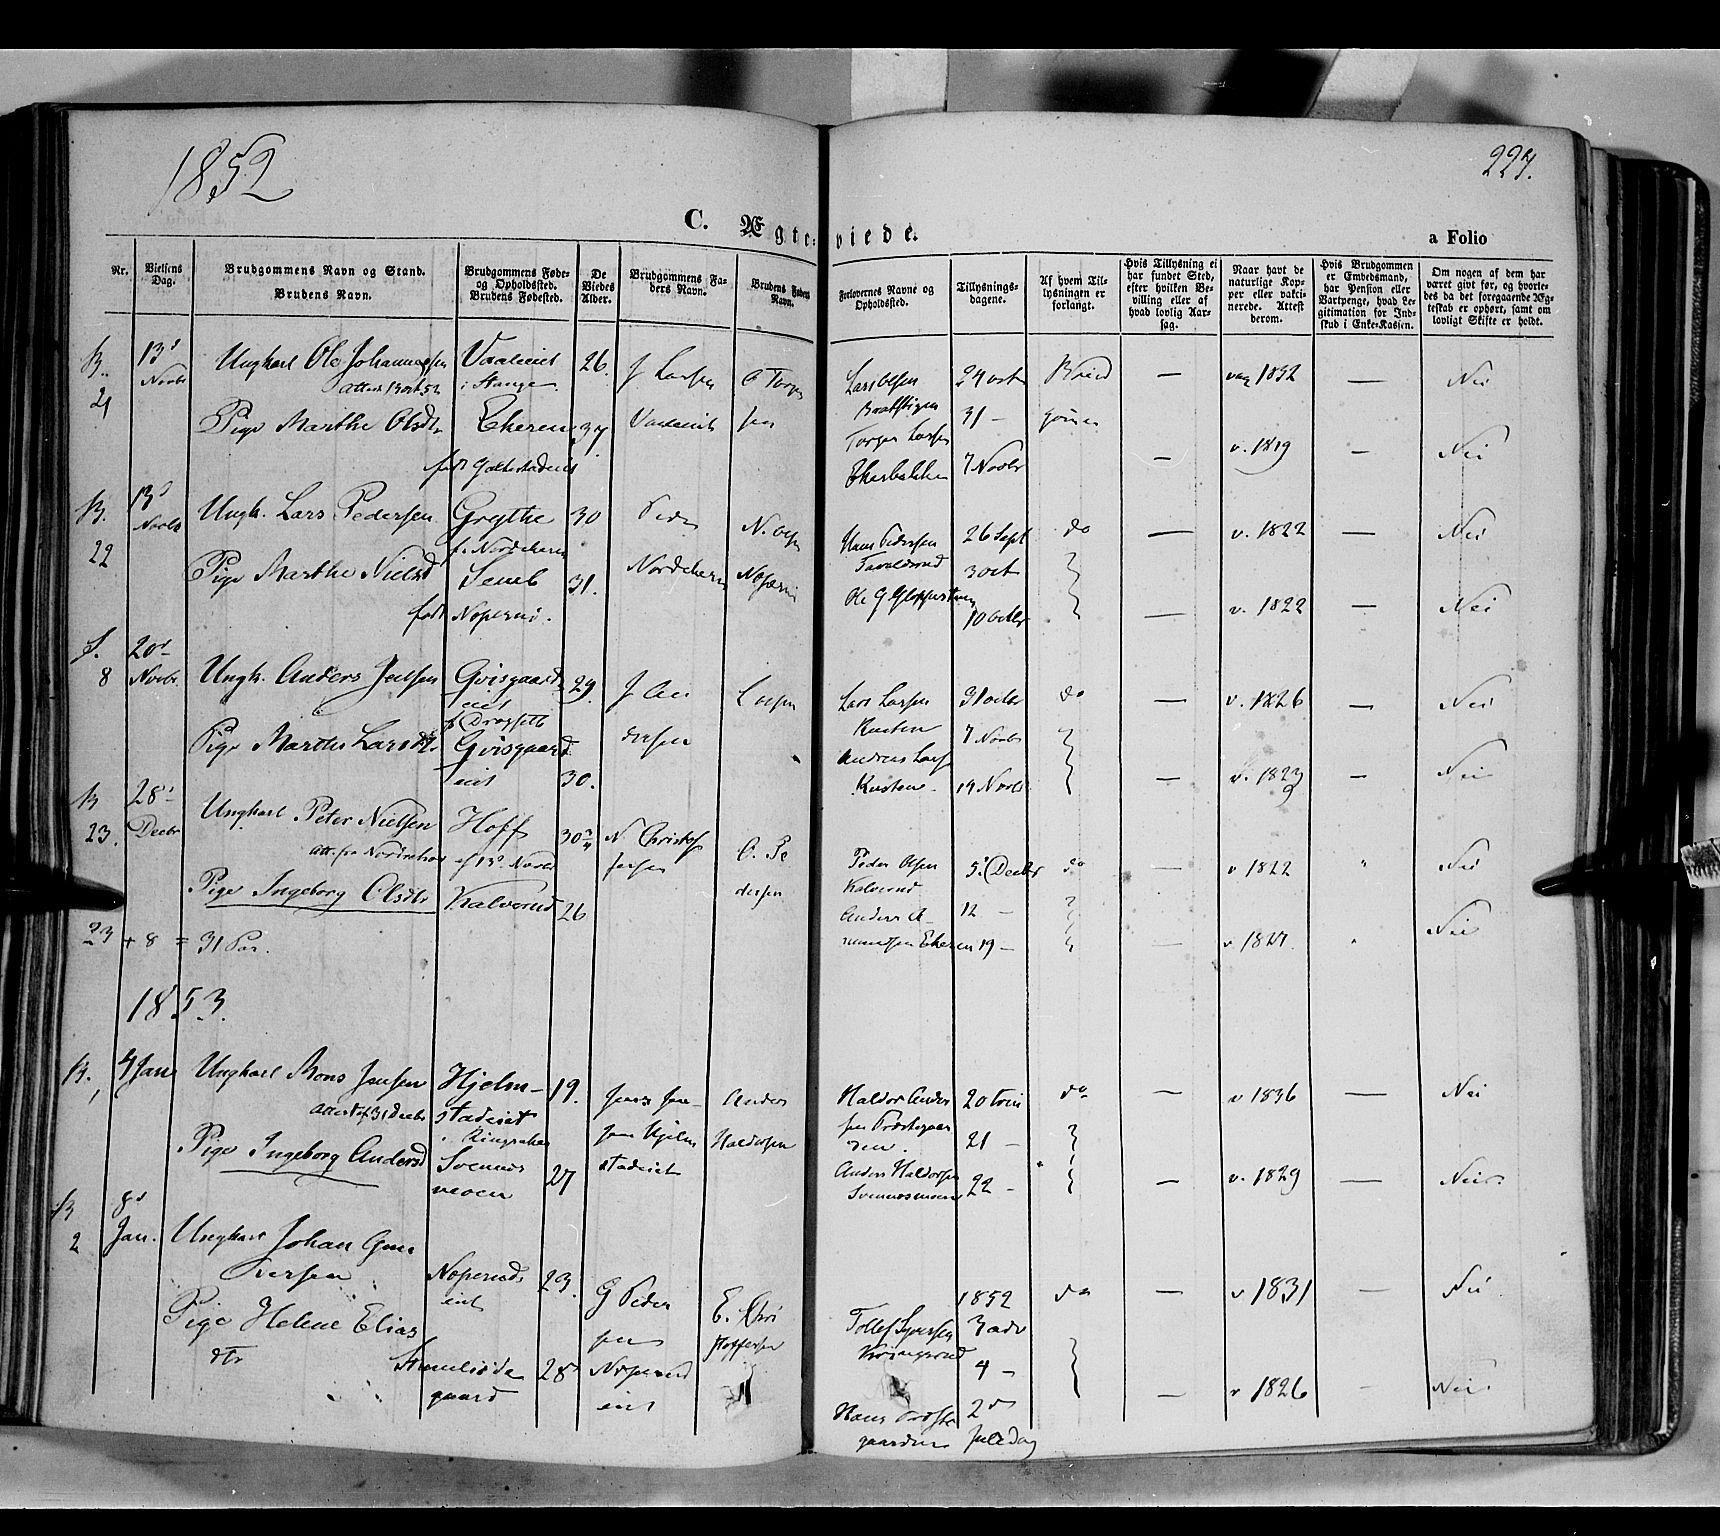 SAH, Biri prestekontor, Ministerialbok nr. 5, 1843-1854, s. 224